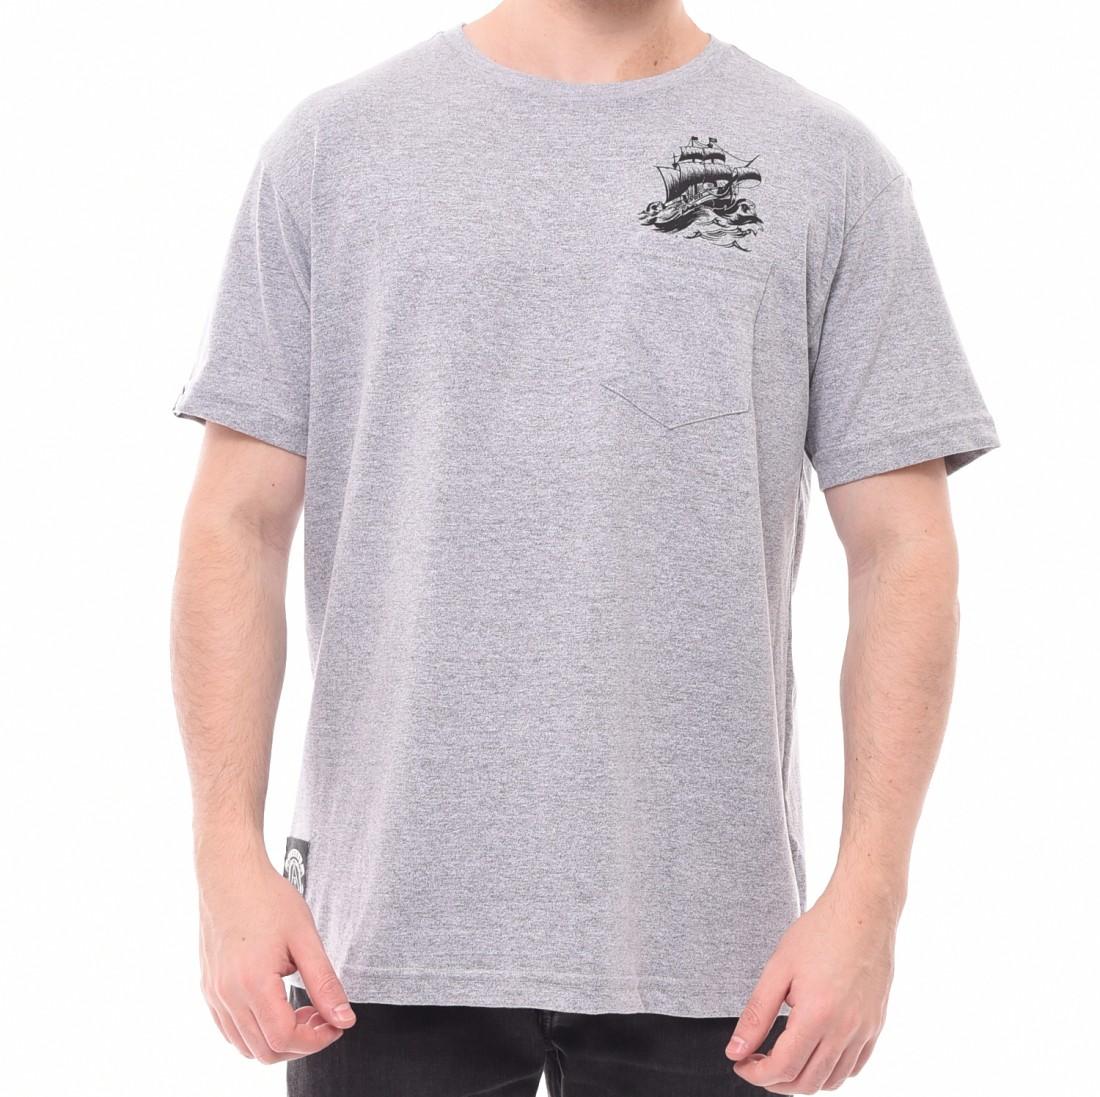 Camiseta Okdok Estampa Barco com Bolso Cinza Mescla - LM Martins ... 3eb634bc5321f